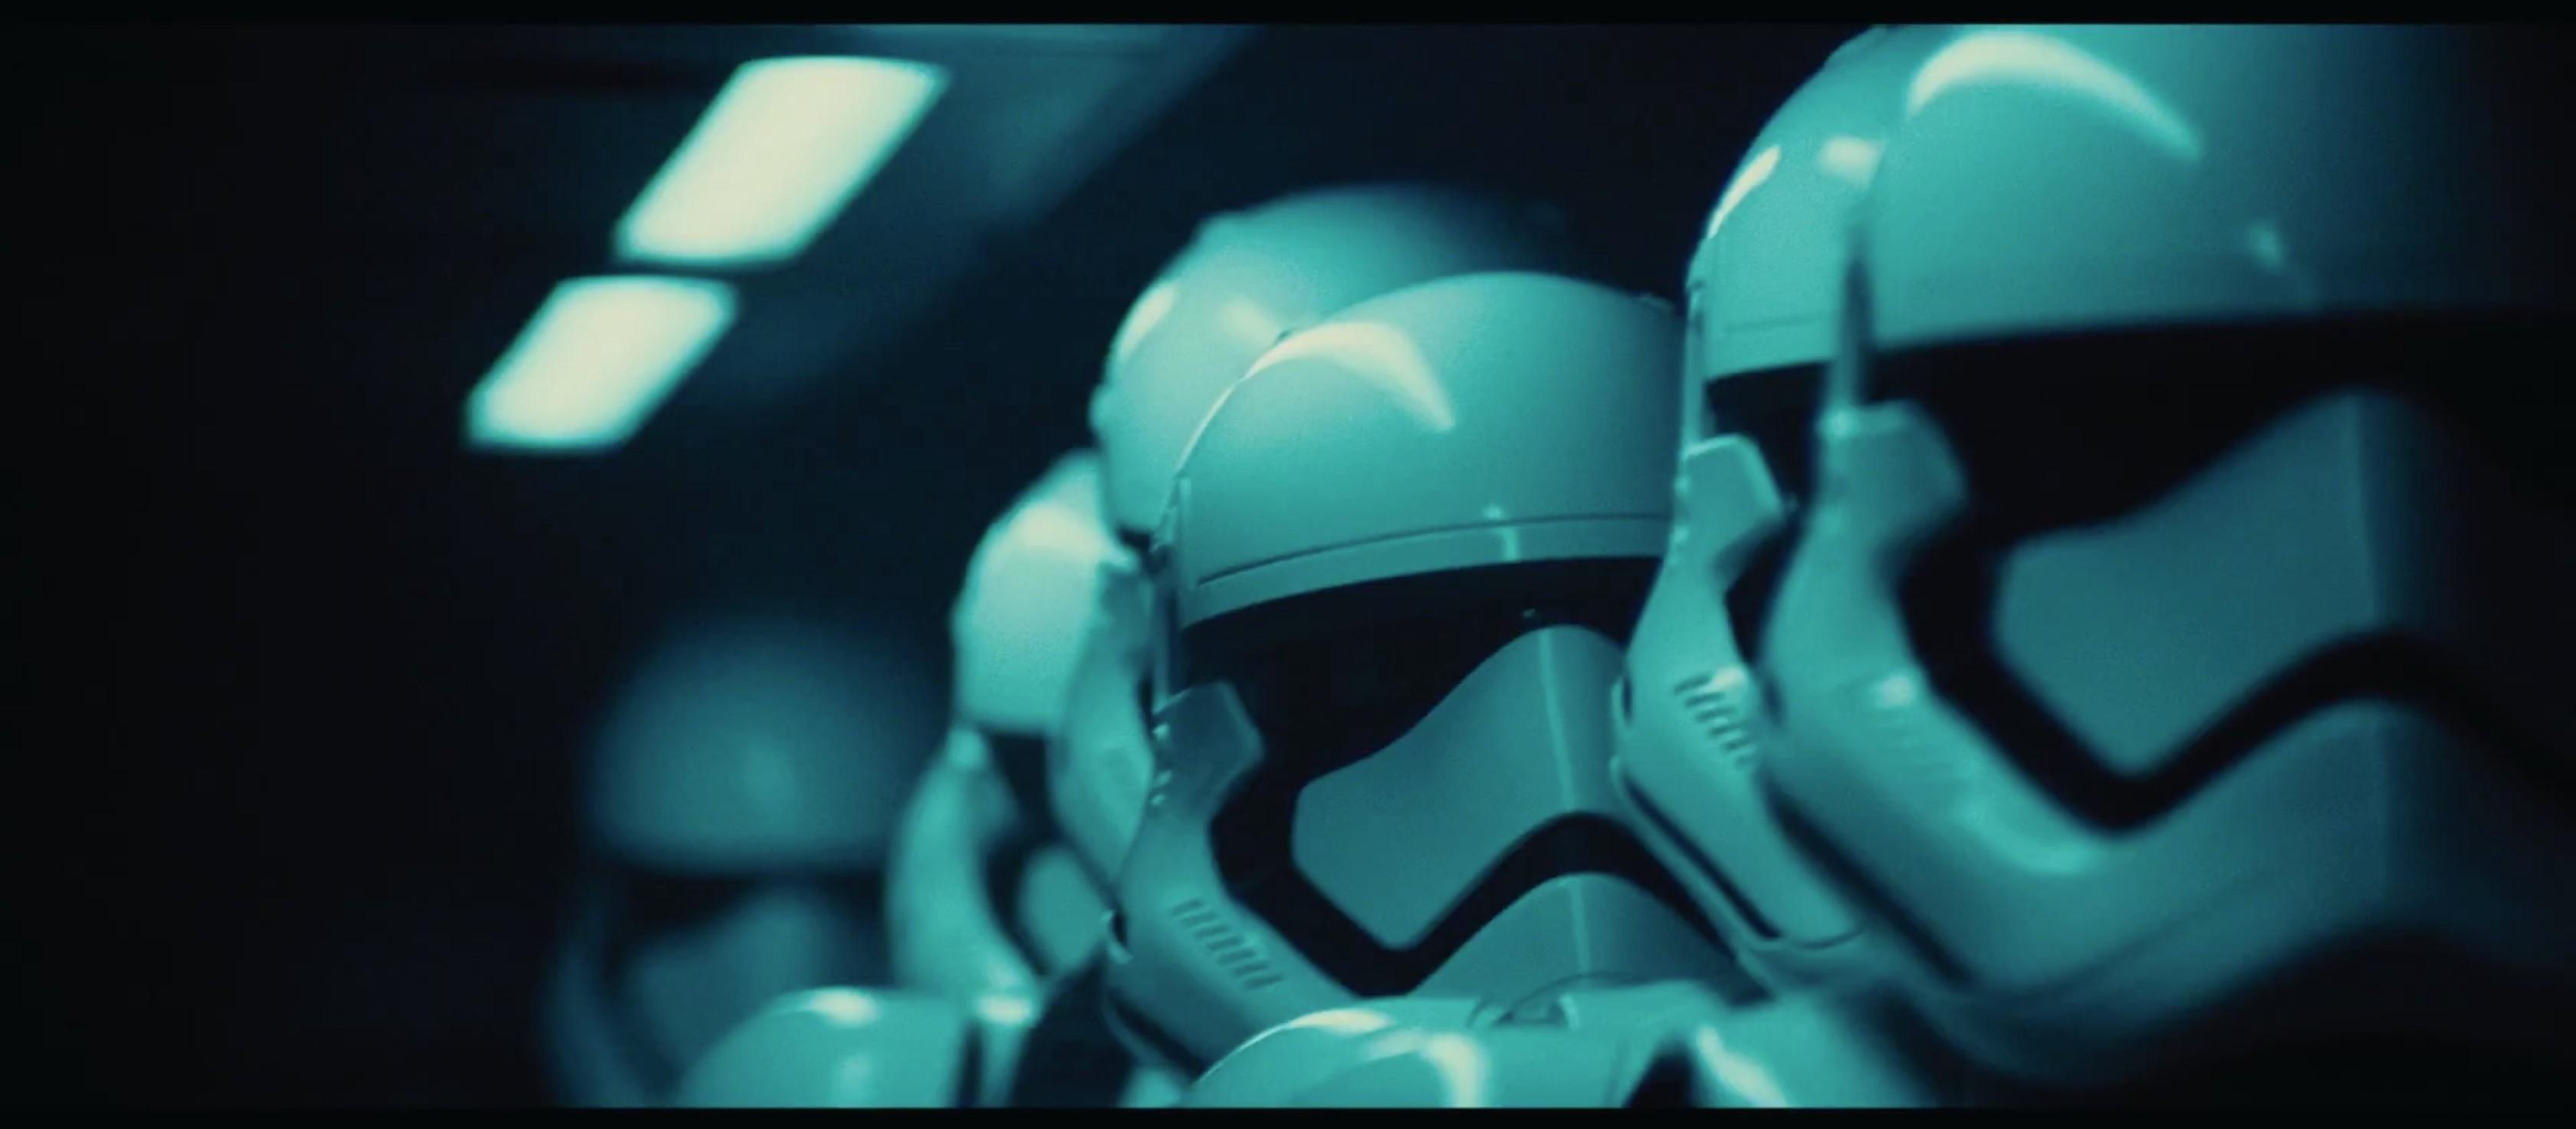 Star Wars Episode 7 wallpapers hd